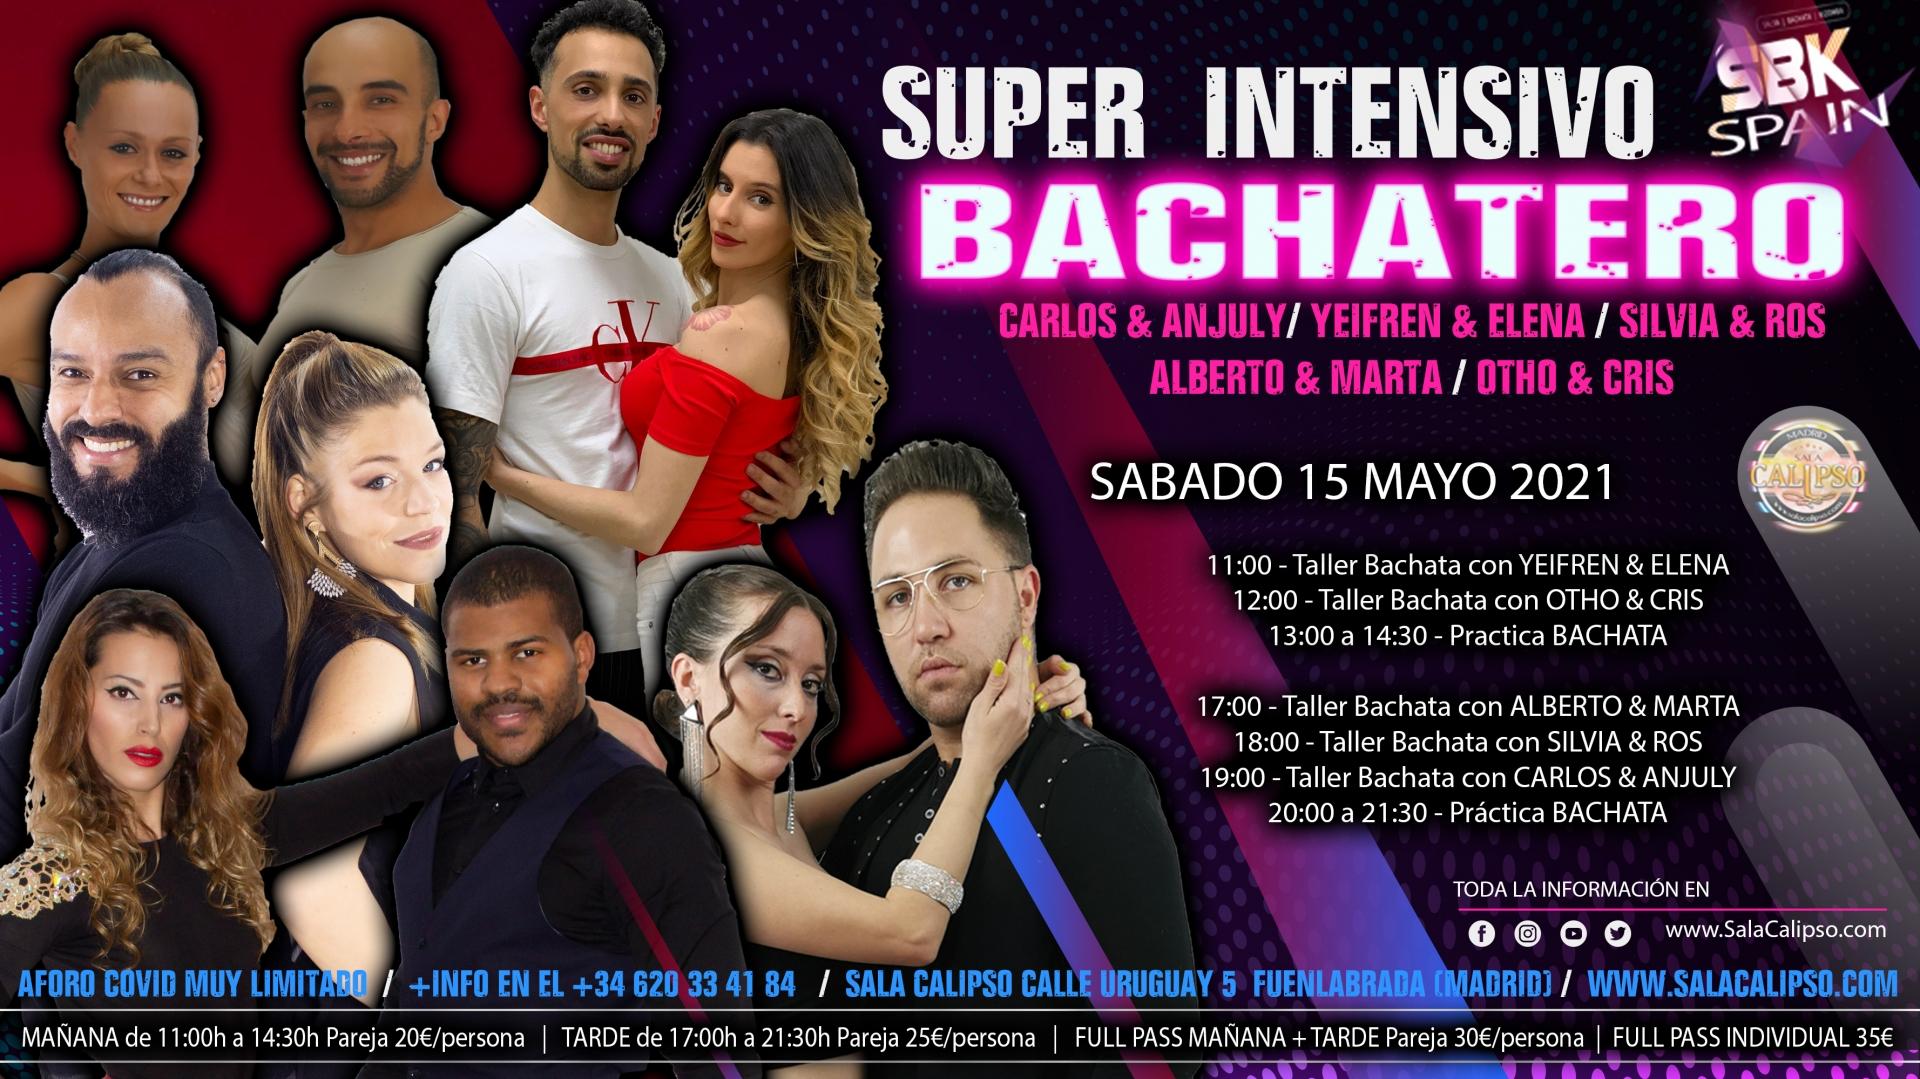 Super Intensivo BACHATERO Sabado 15 Mayo 2021